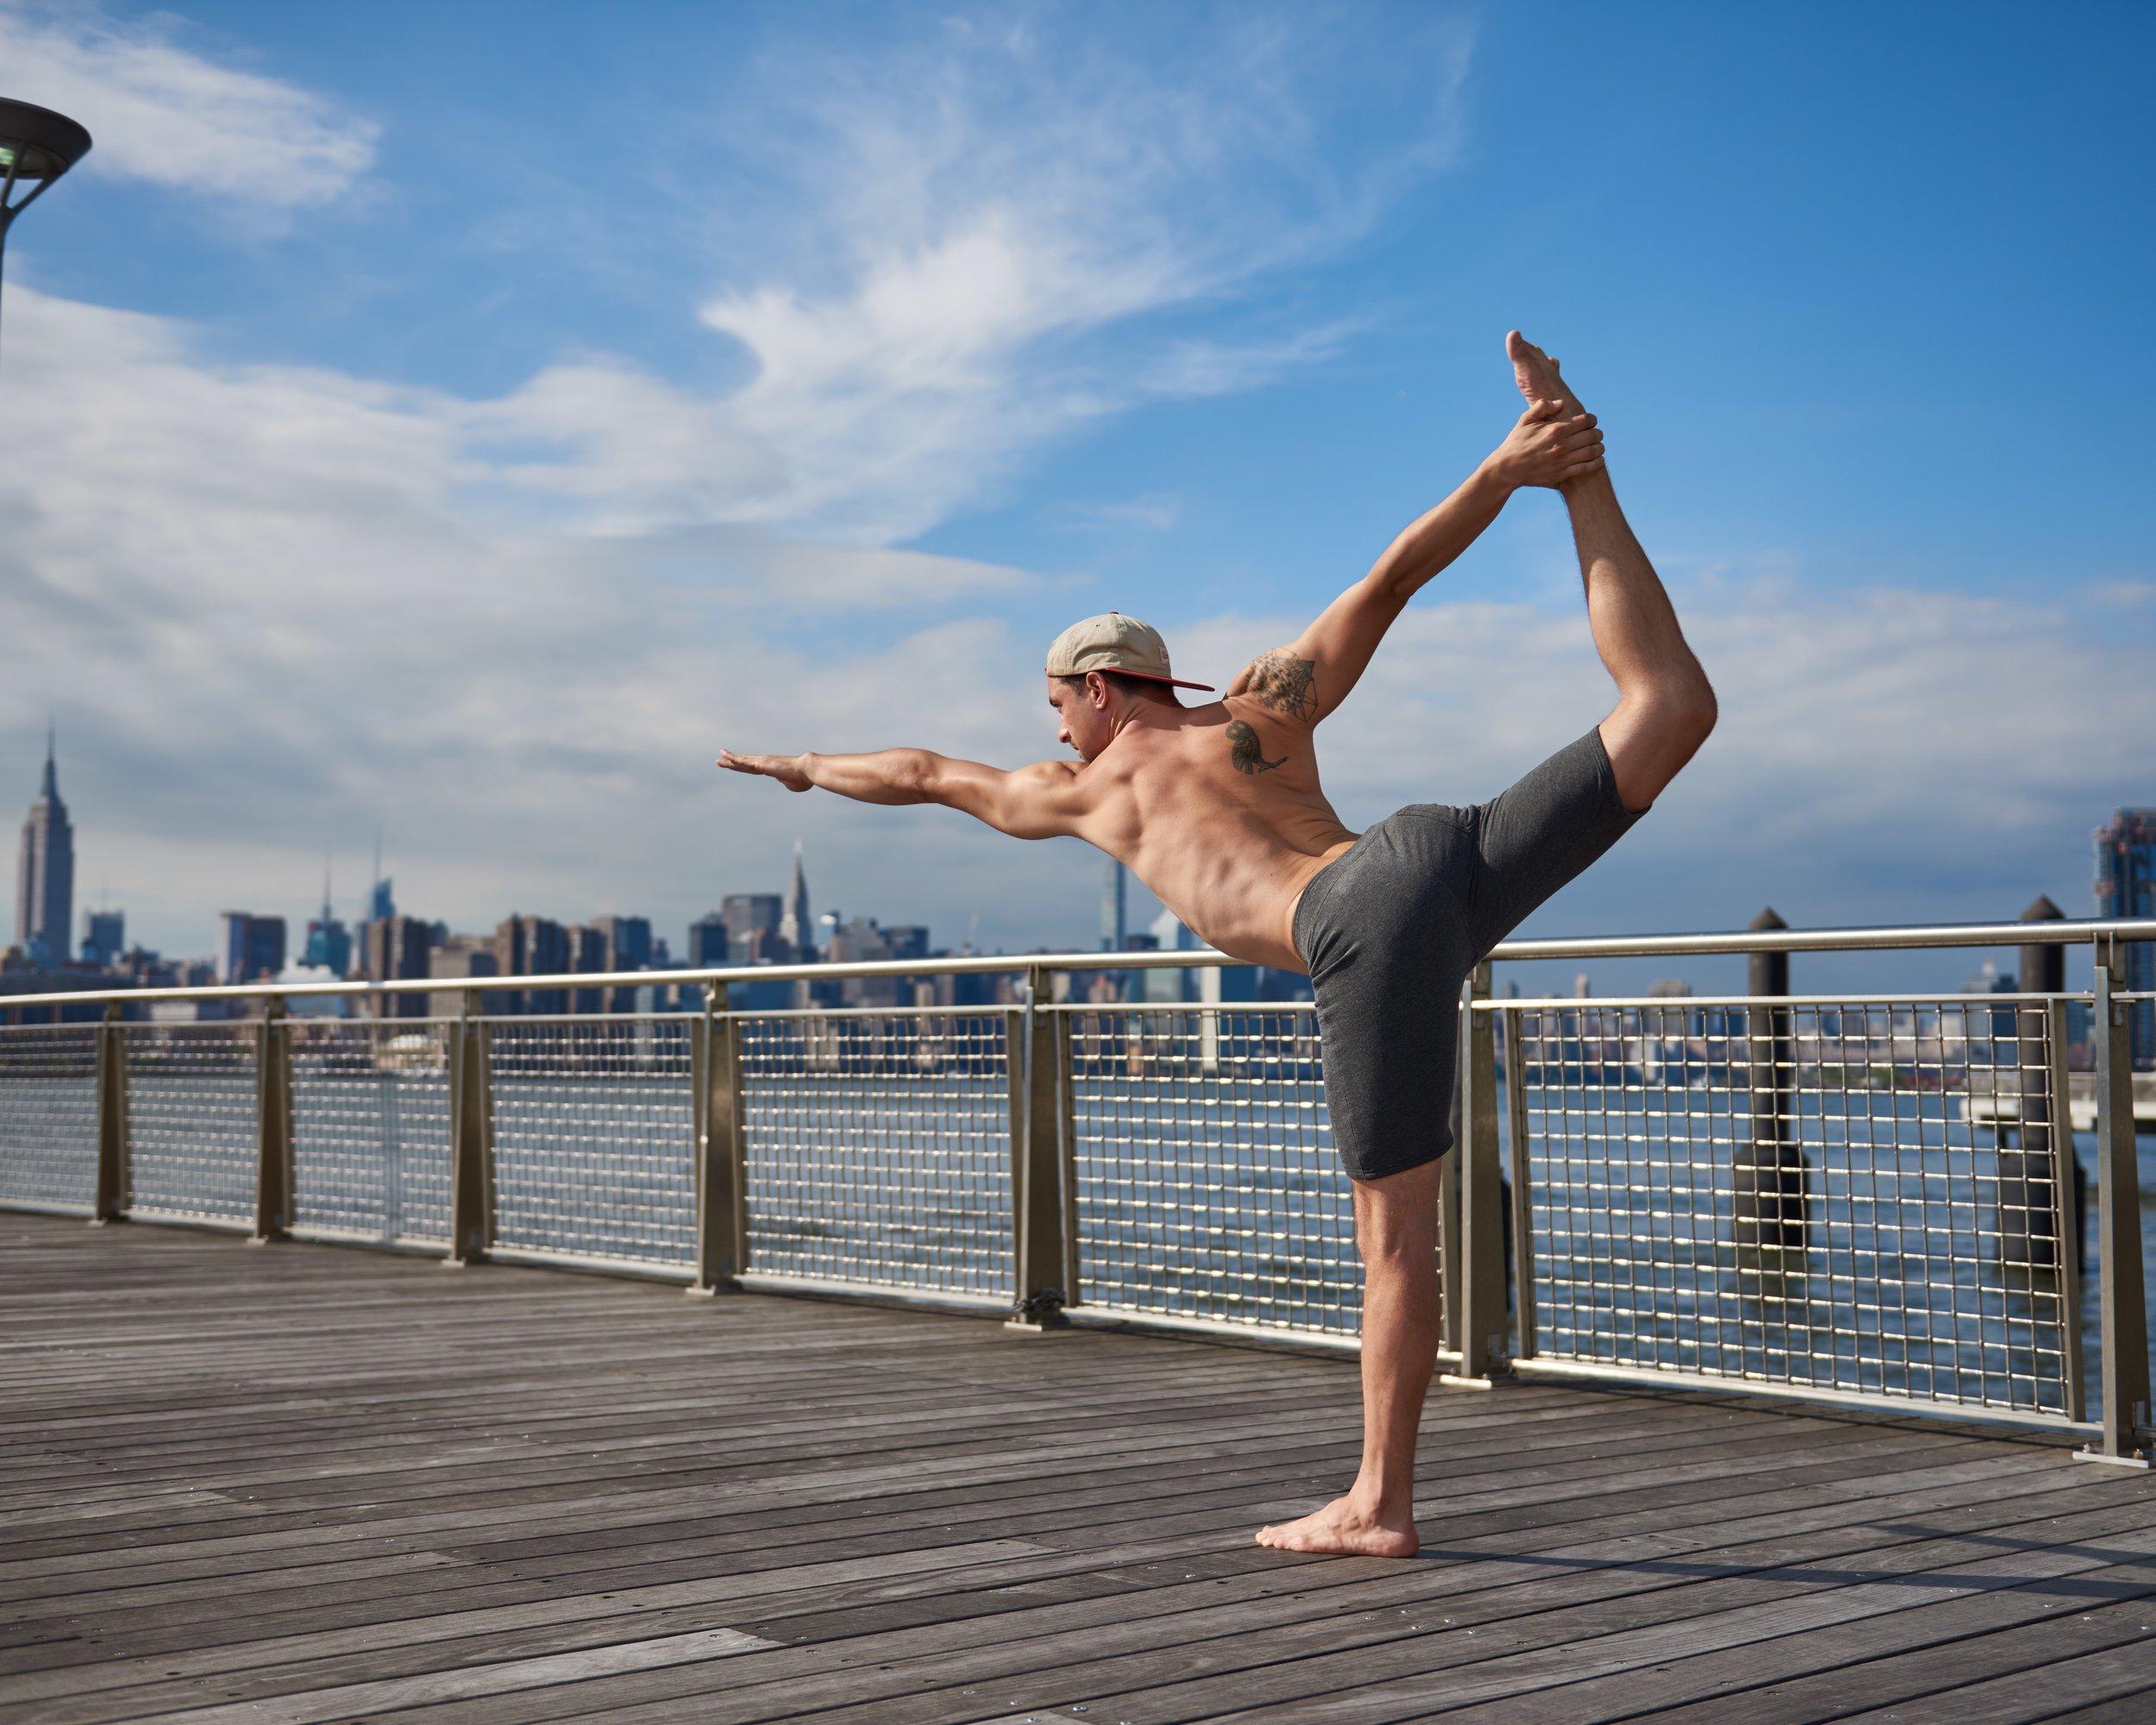 Yoga even on a boardwalk with your Warrior Wear Gear!